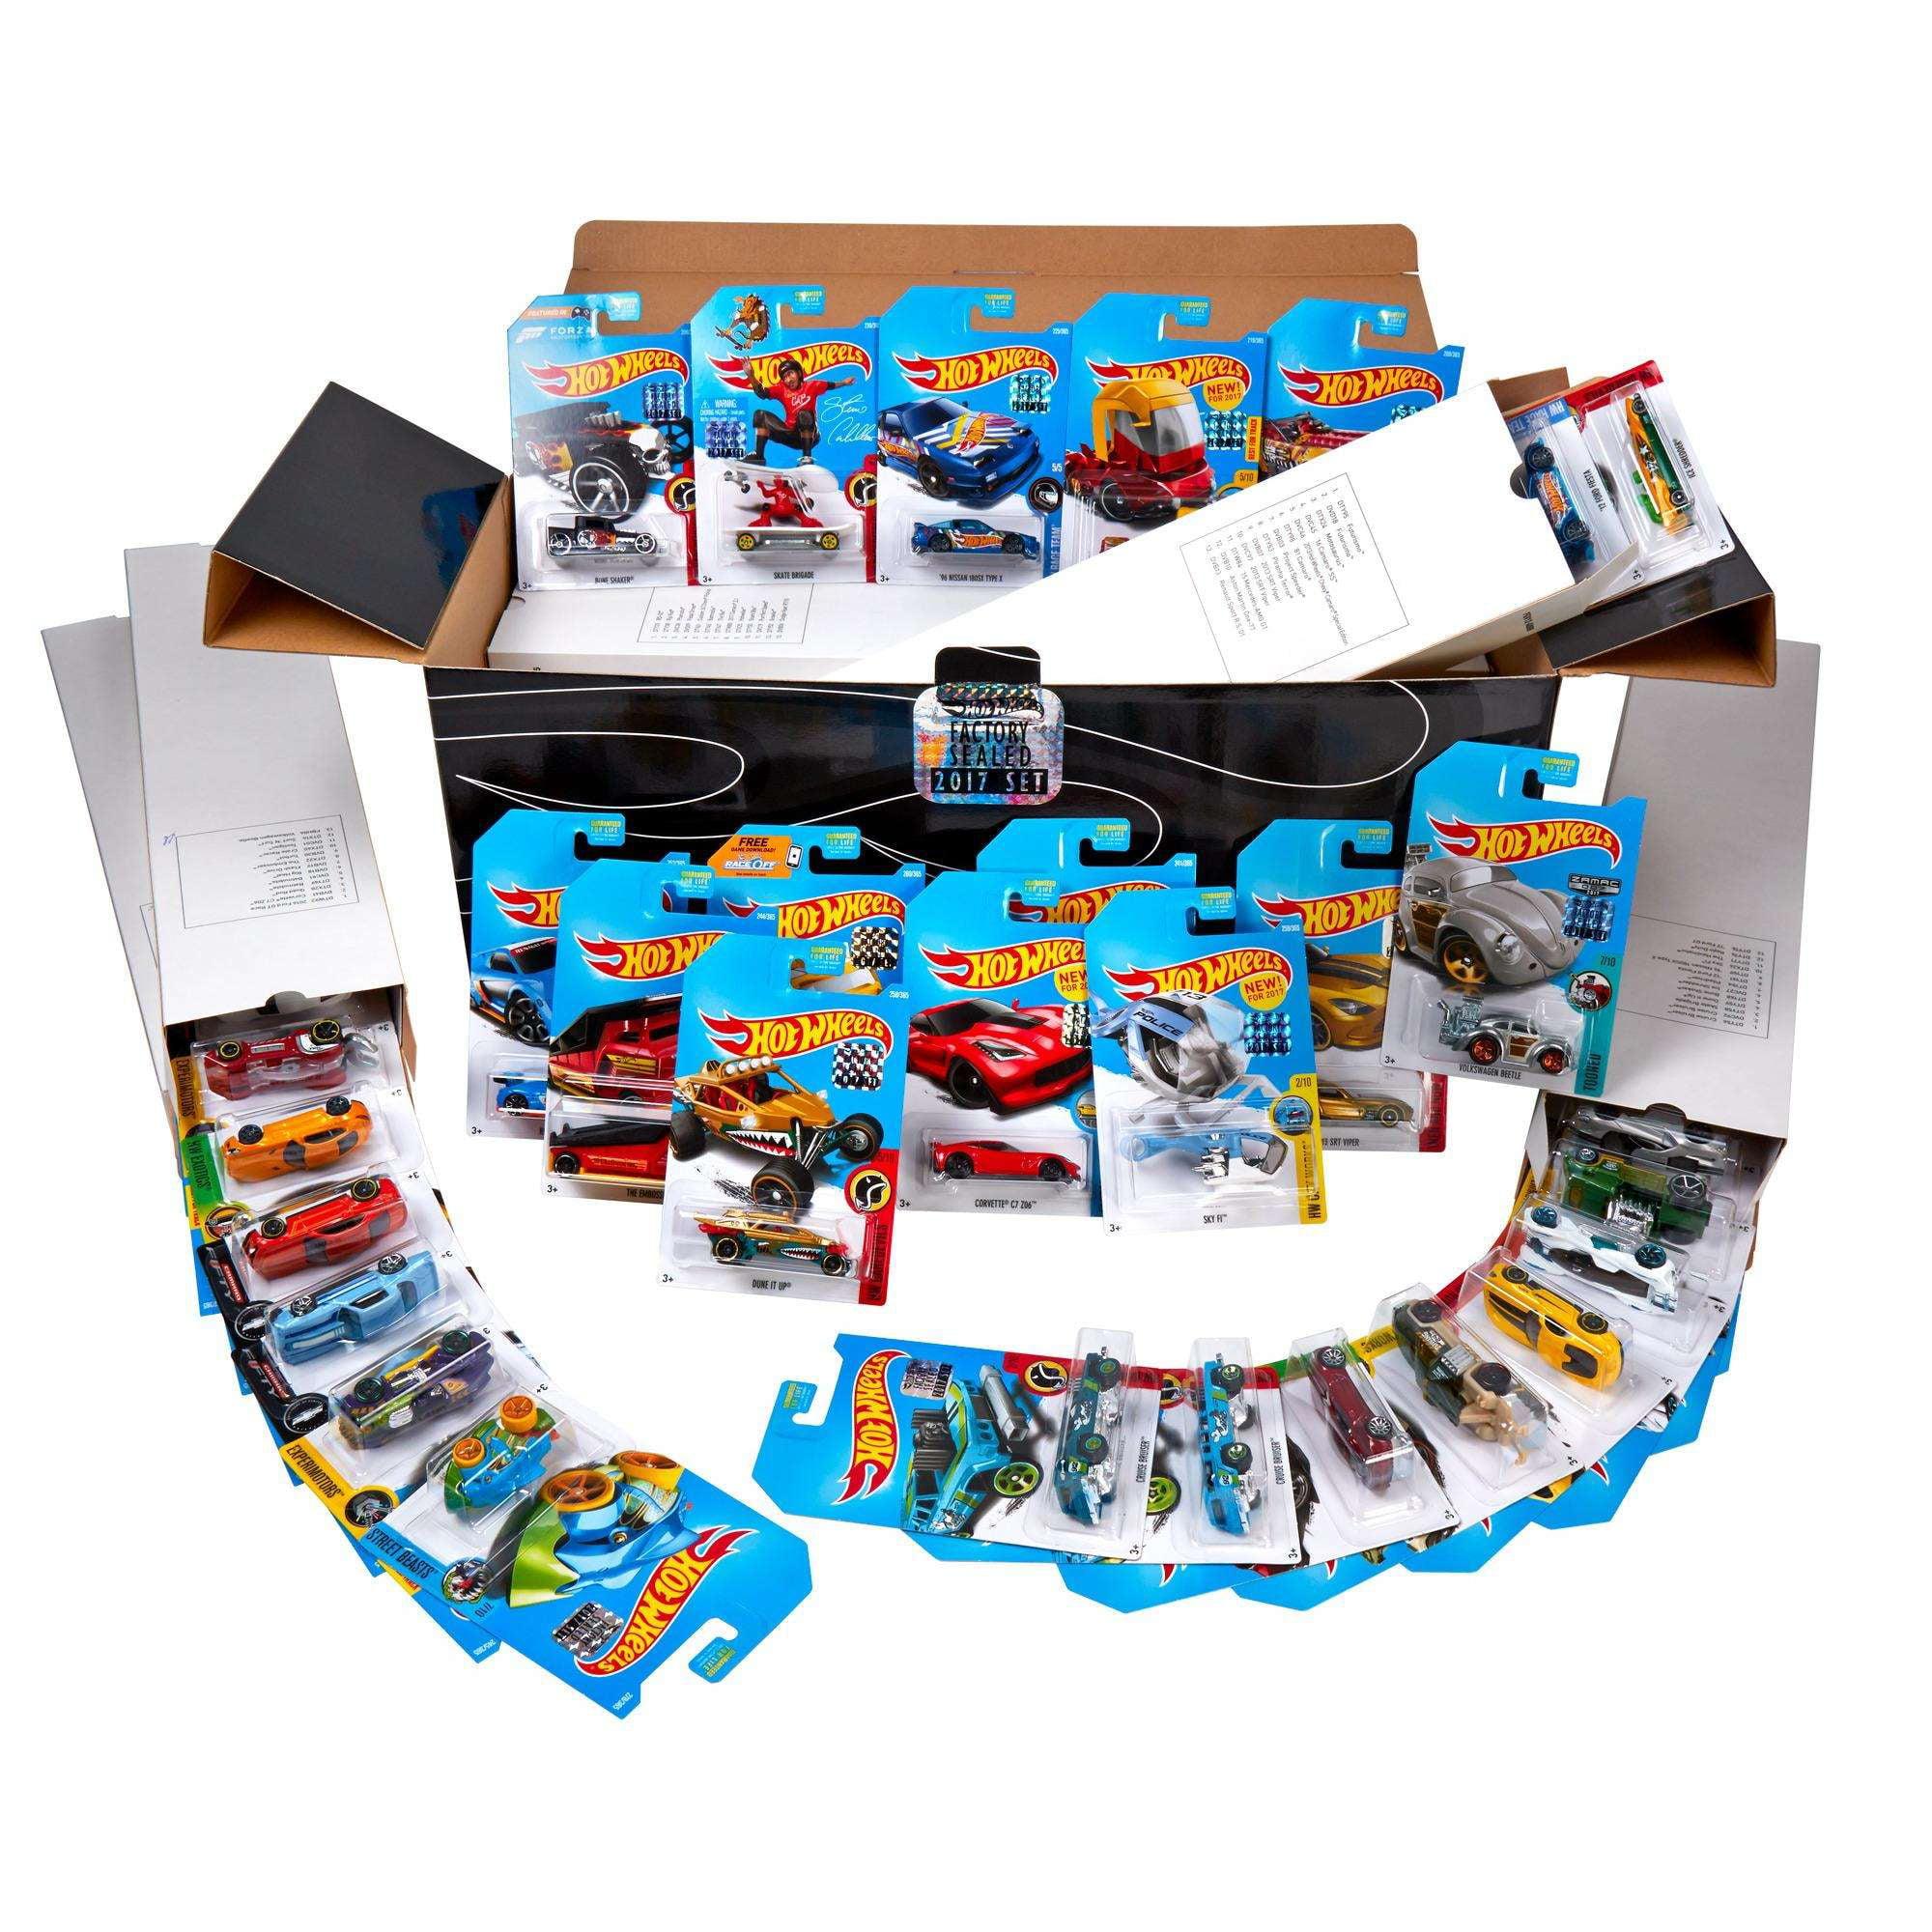 Hot Wheels Mini Set 3 by Mattel